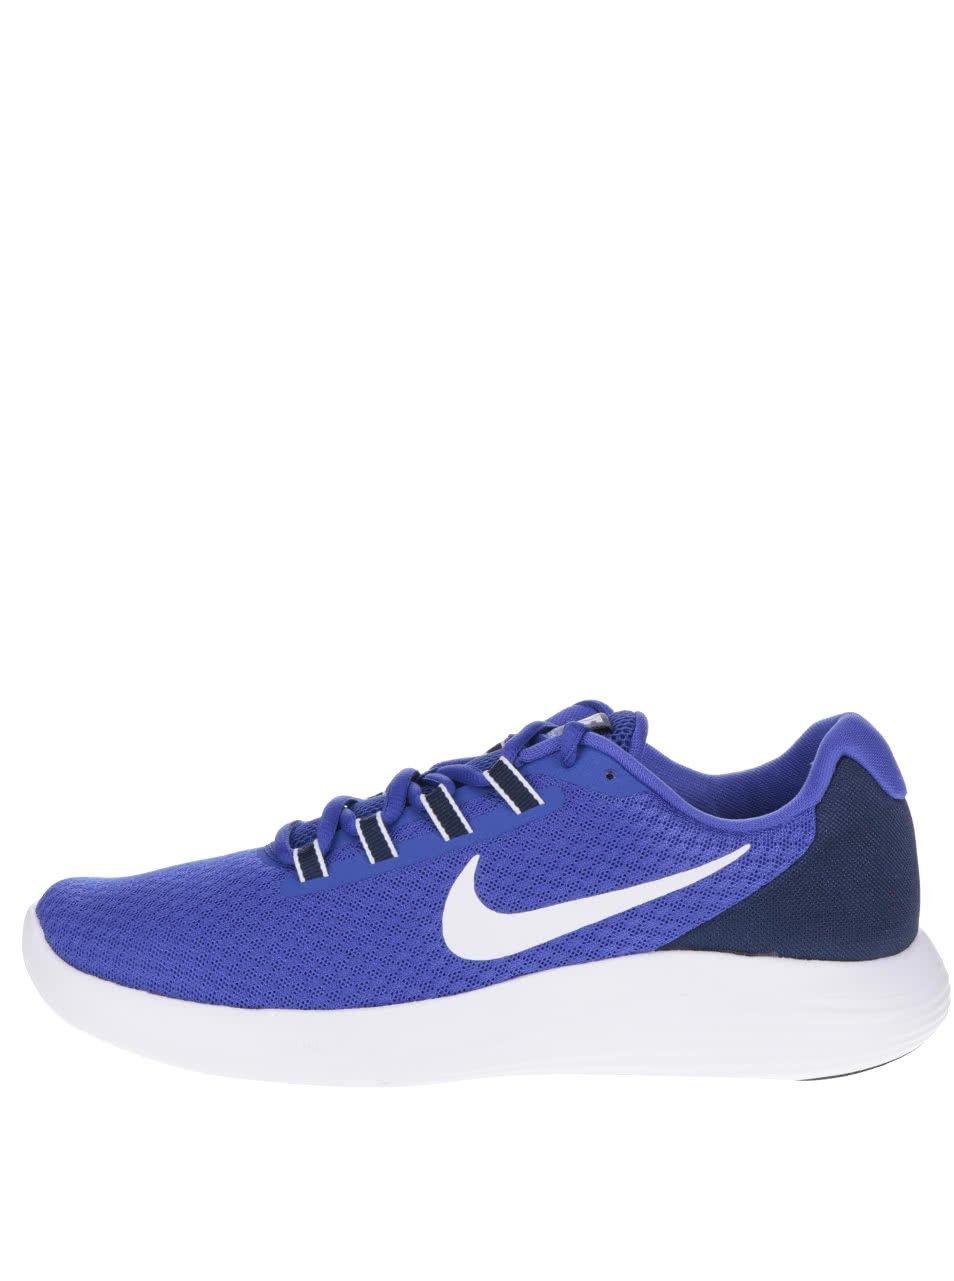 Modré pánské tenisky Nike Lunar Converge